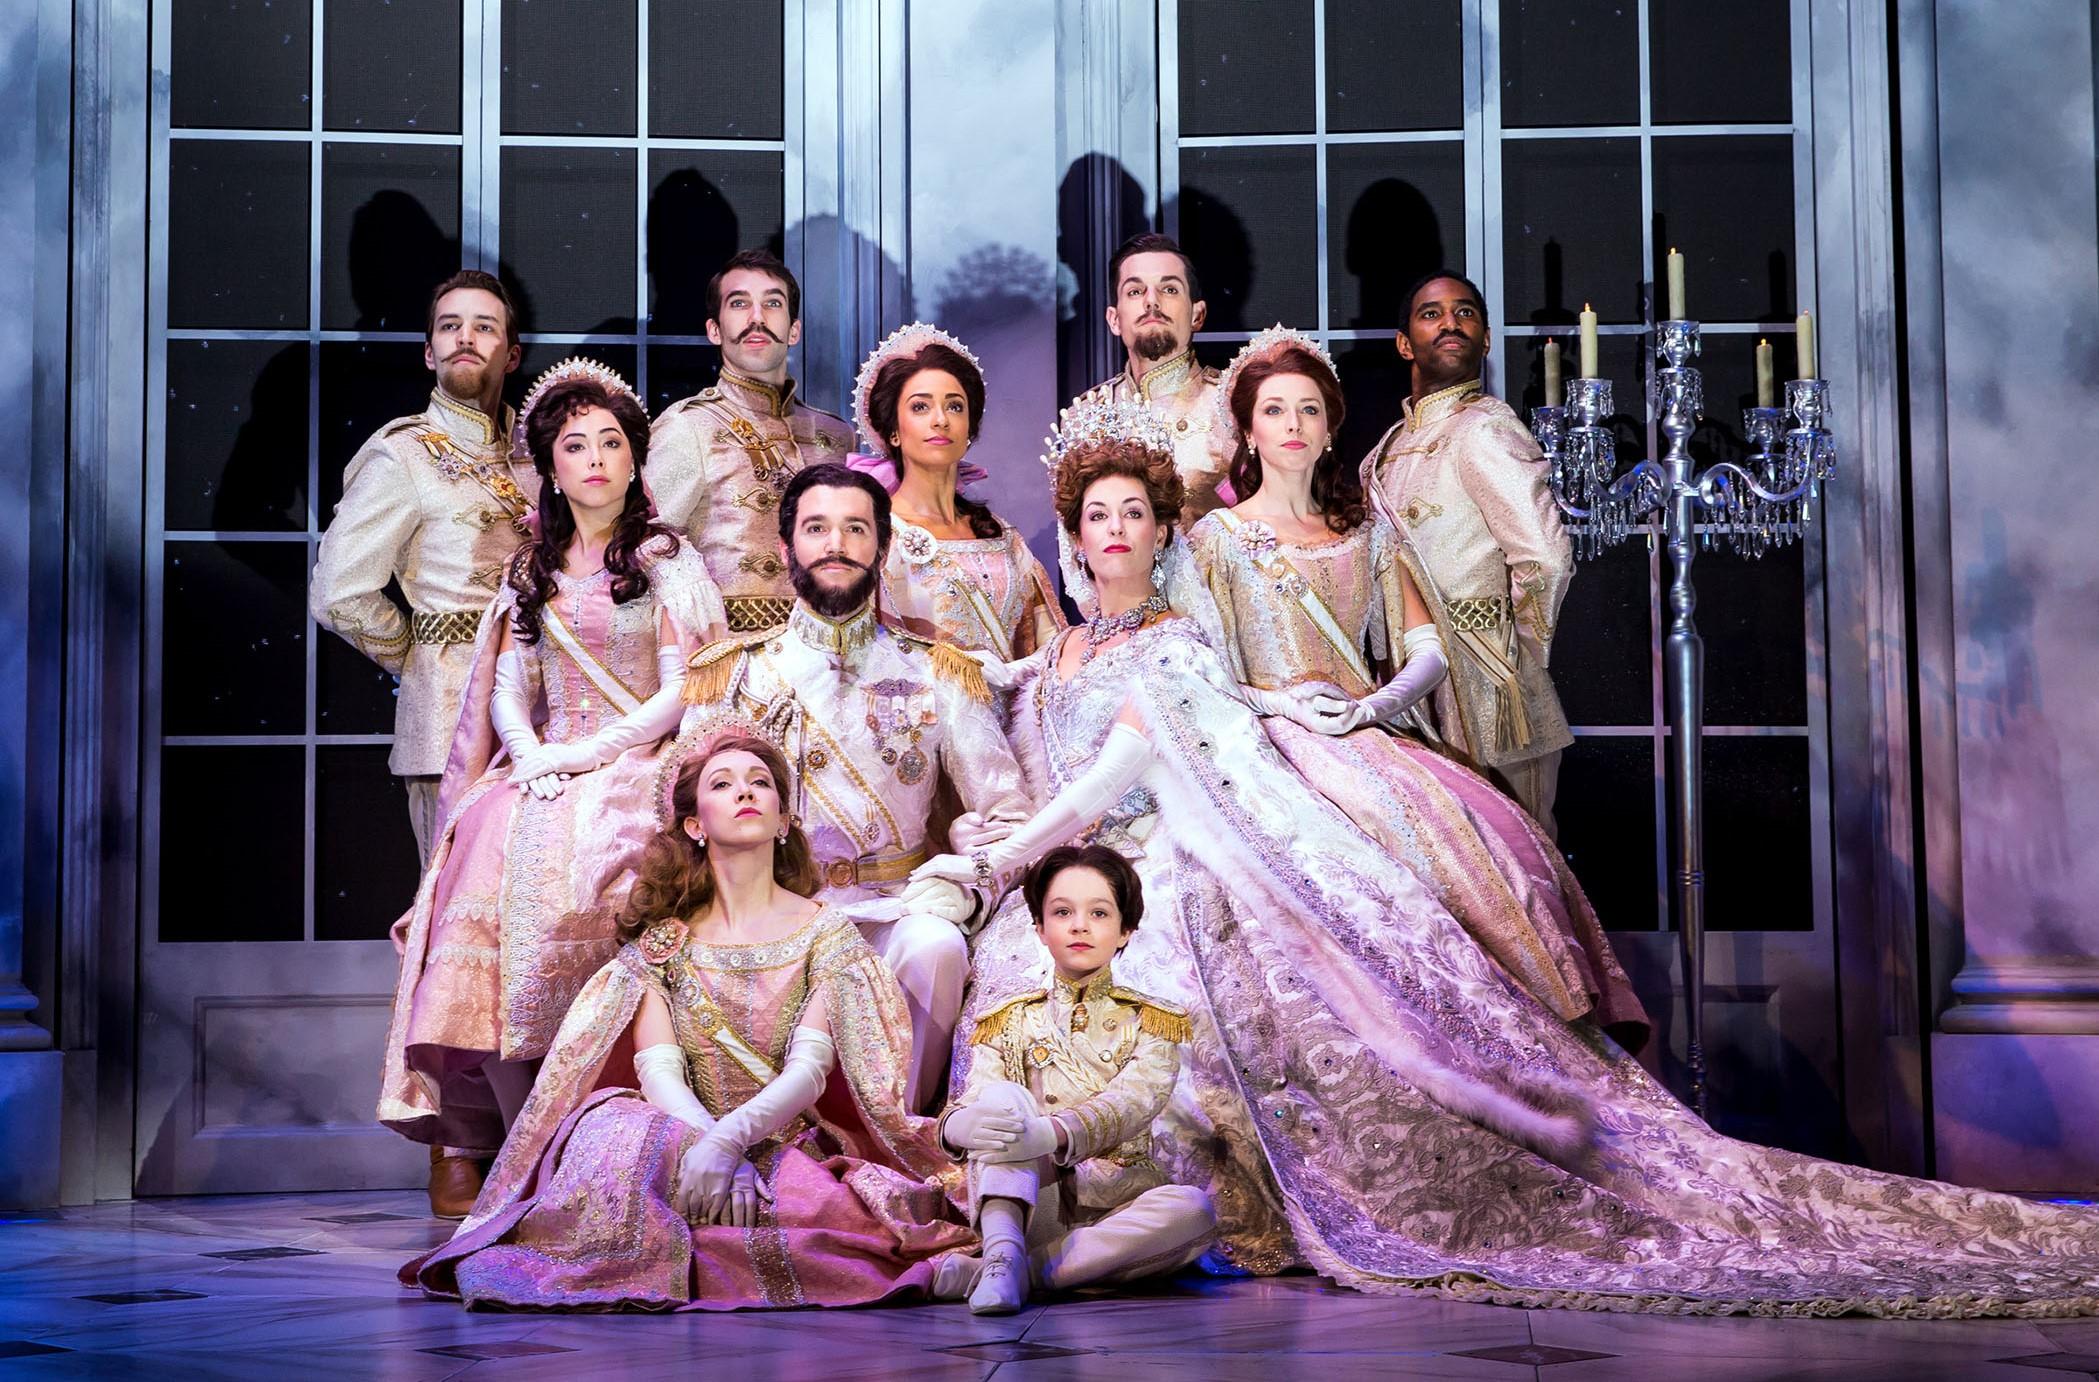 [2588]_The cast of ANASTASIA in ANASTASIA on Broadway, Photo by Matthew Murphy, 2017